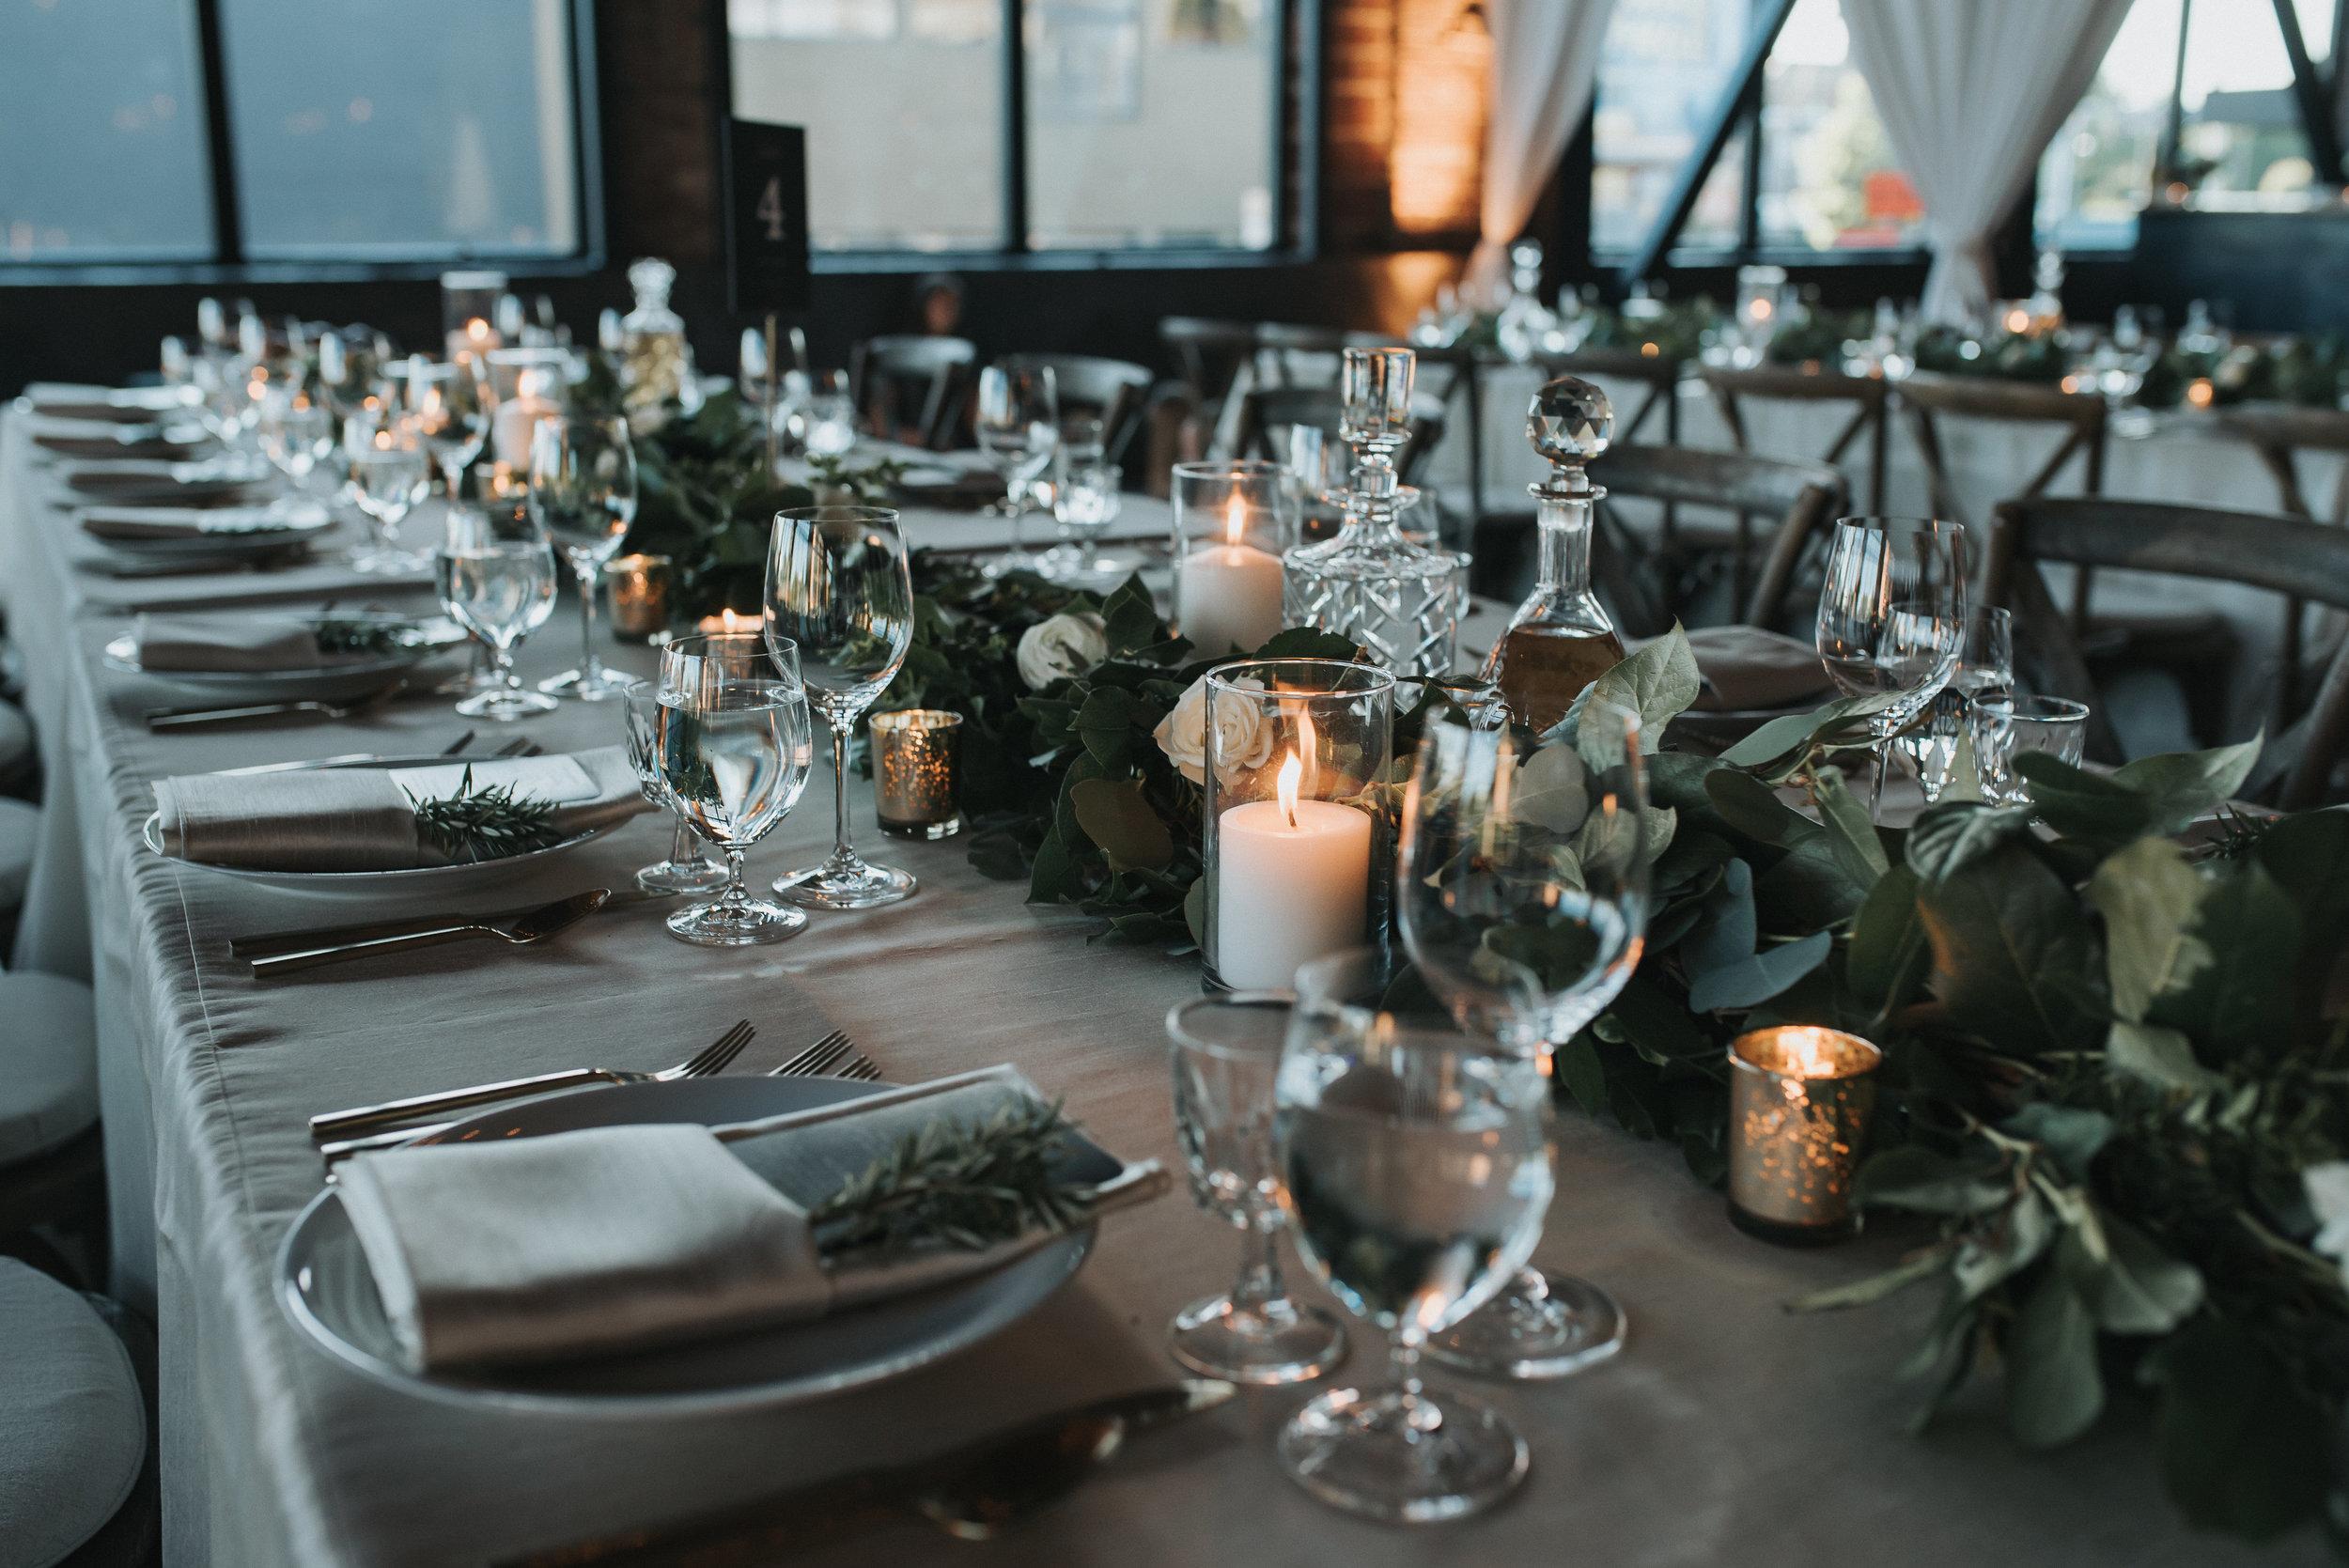 Bridalbliss.com | Portland Wedding | Oregon Event Planning and Design |  Ellie Asher PhotographyBridalbliss.com | Portland Wedding | Oregon Event Planning and Design |  Ellie Asher Photography